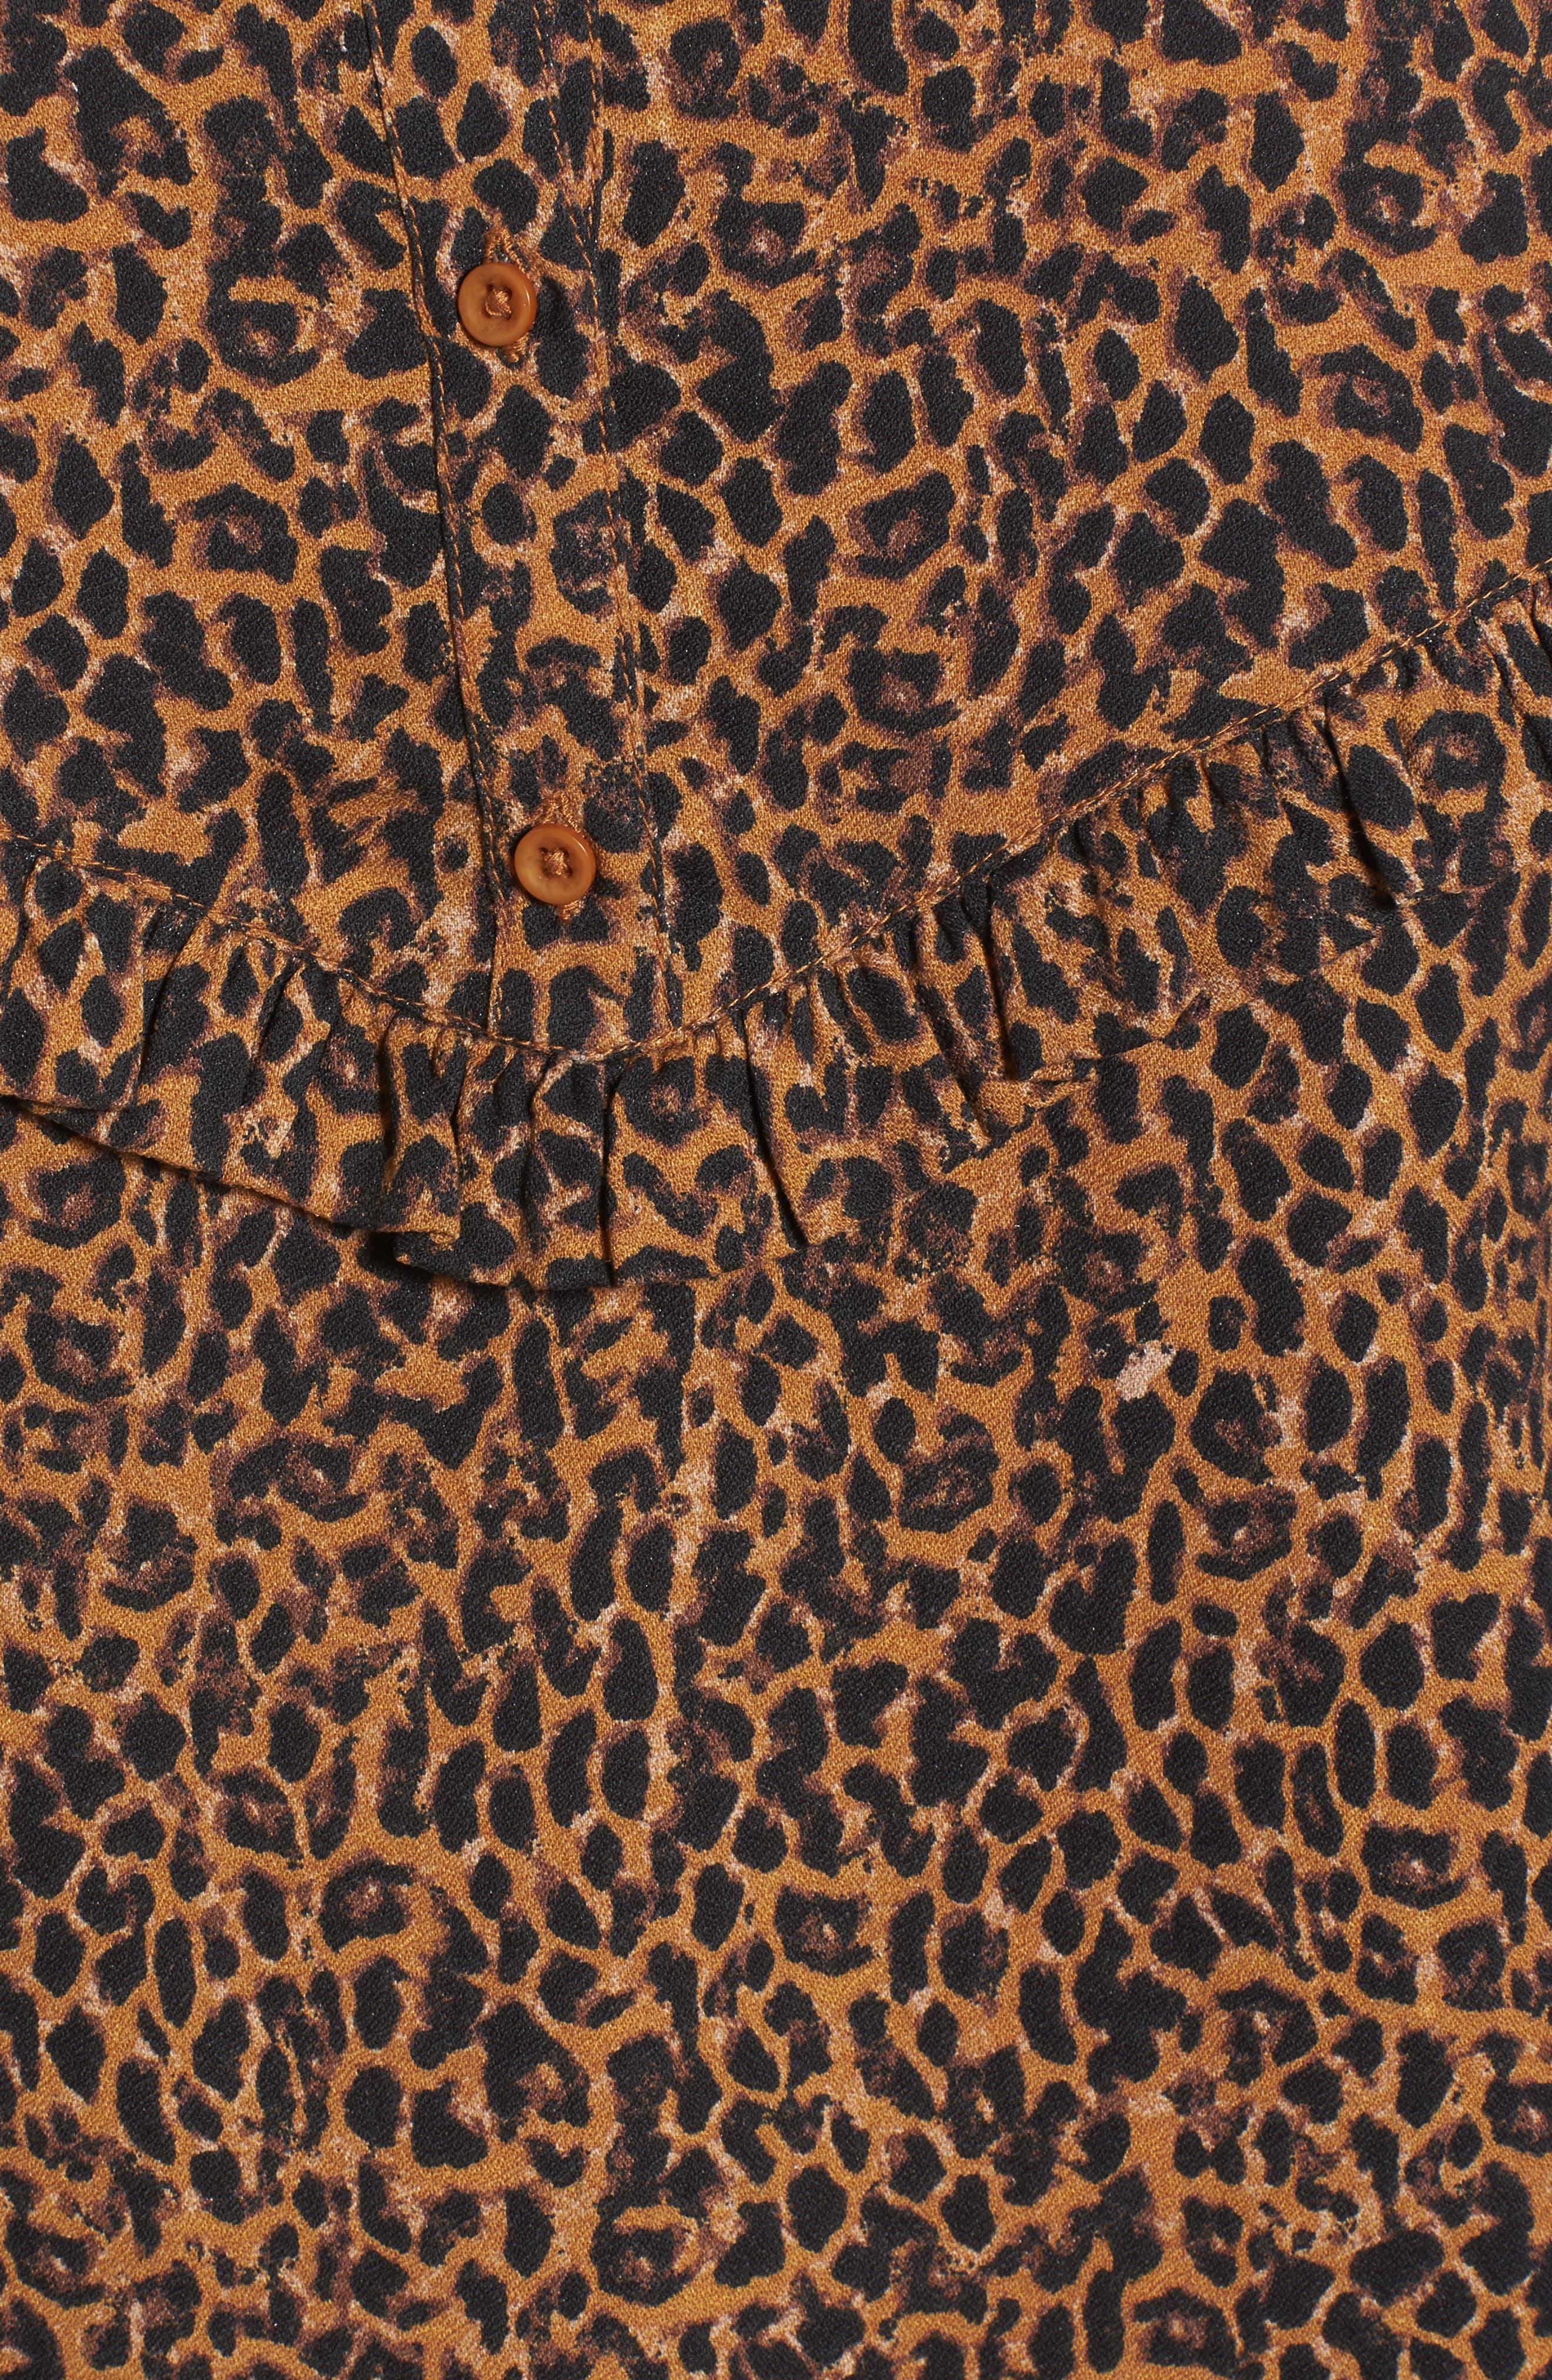 Ruffle Top,                             Alternate thumbnail 5, color,                             Tan Dale Animal